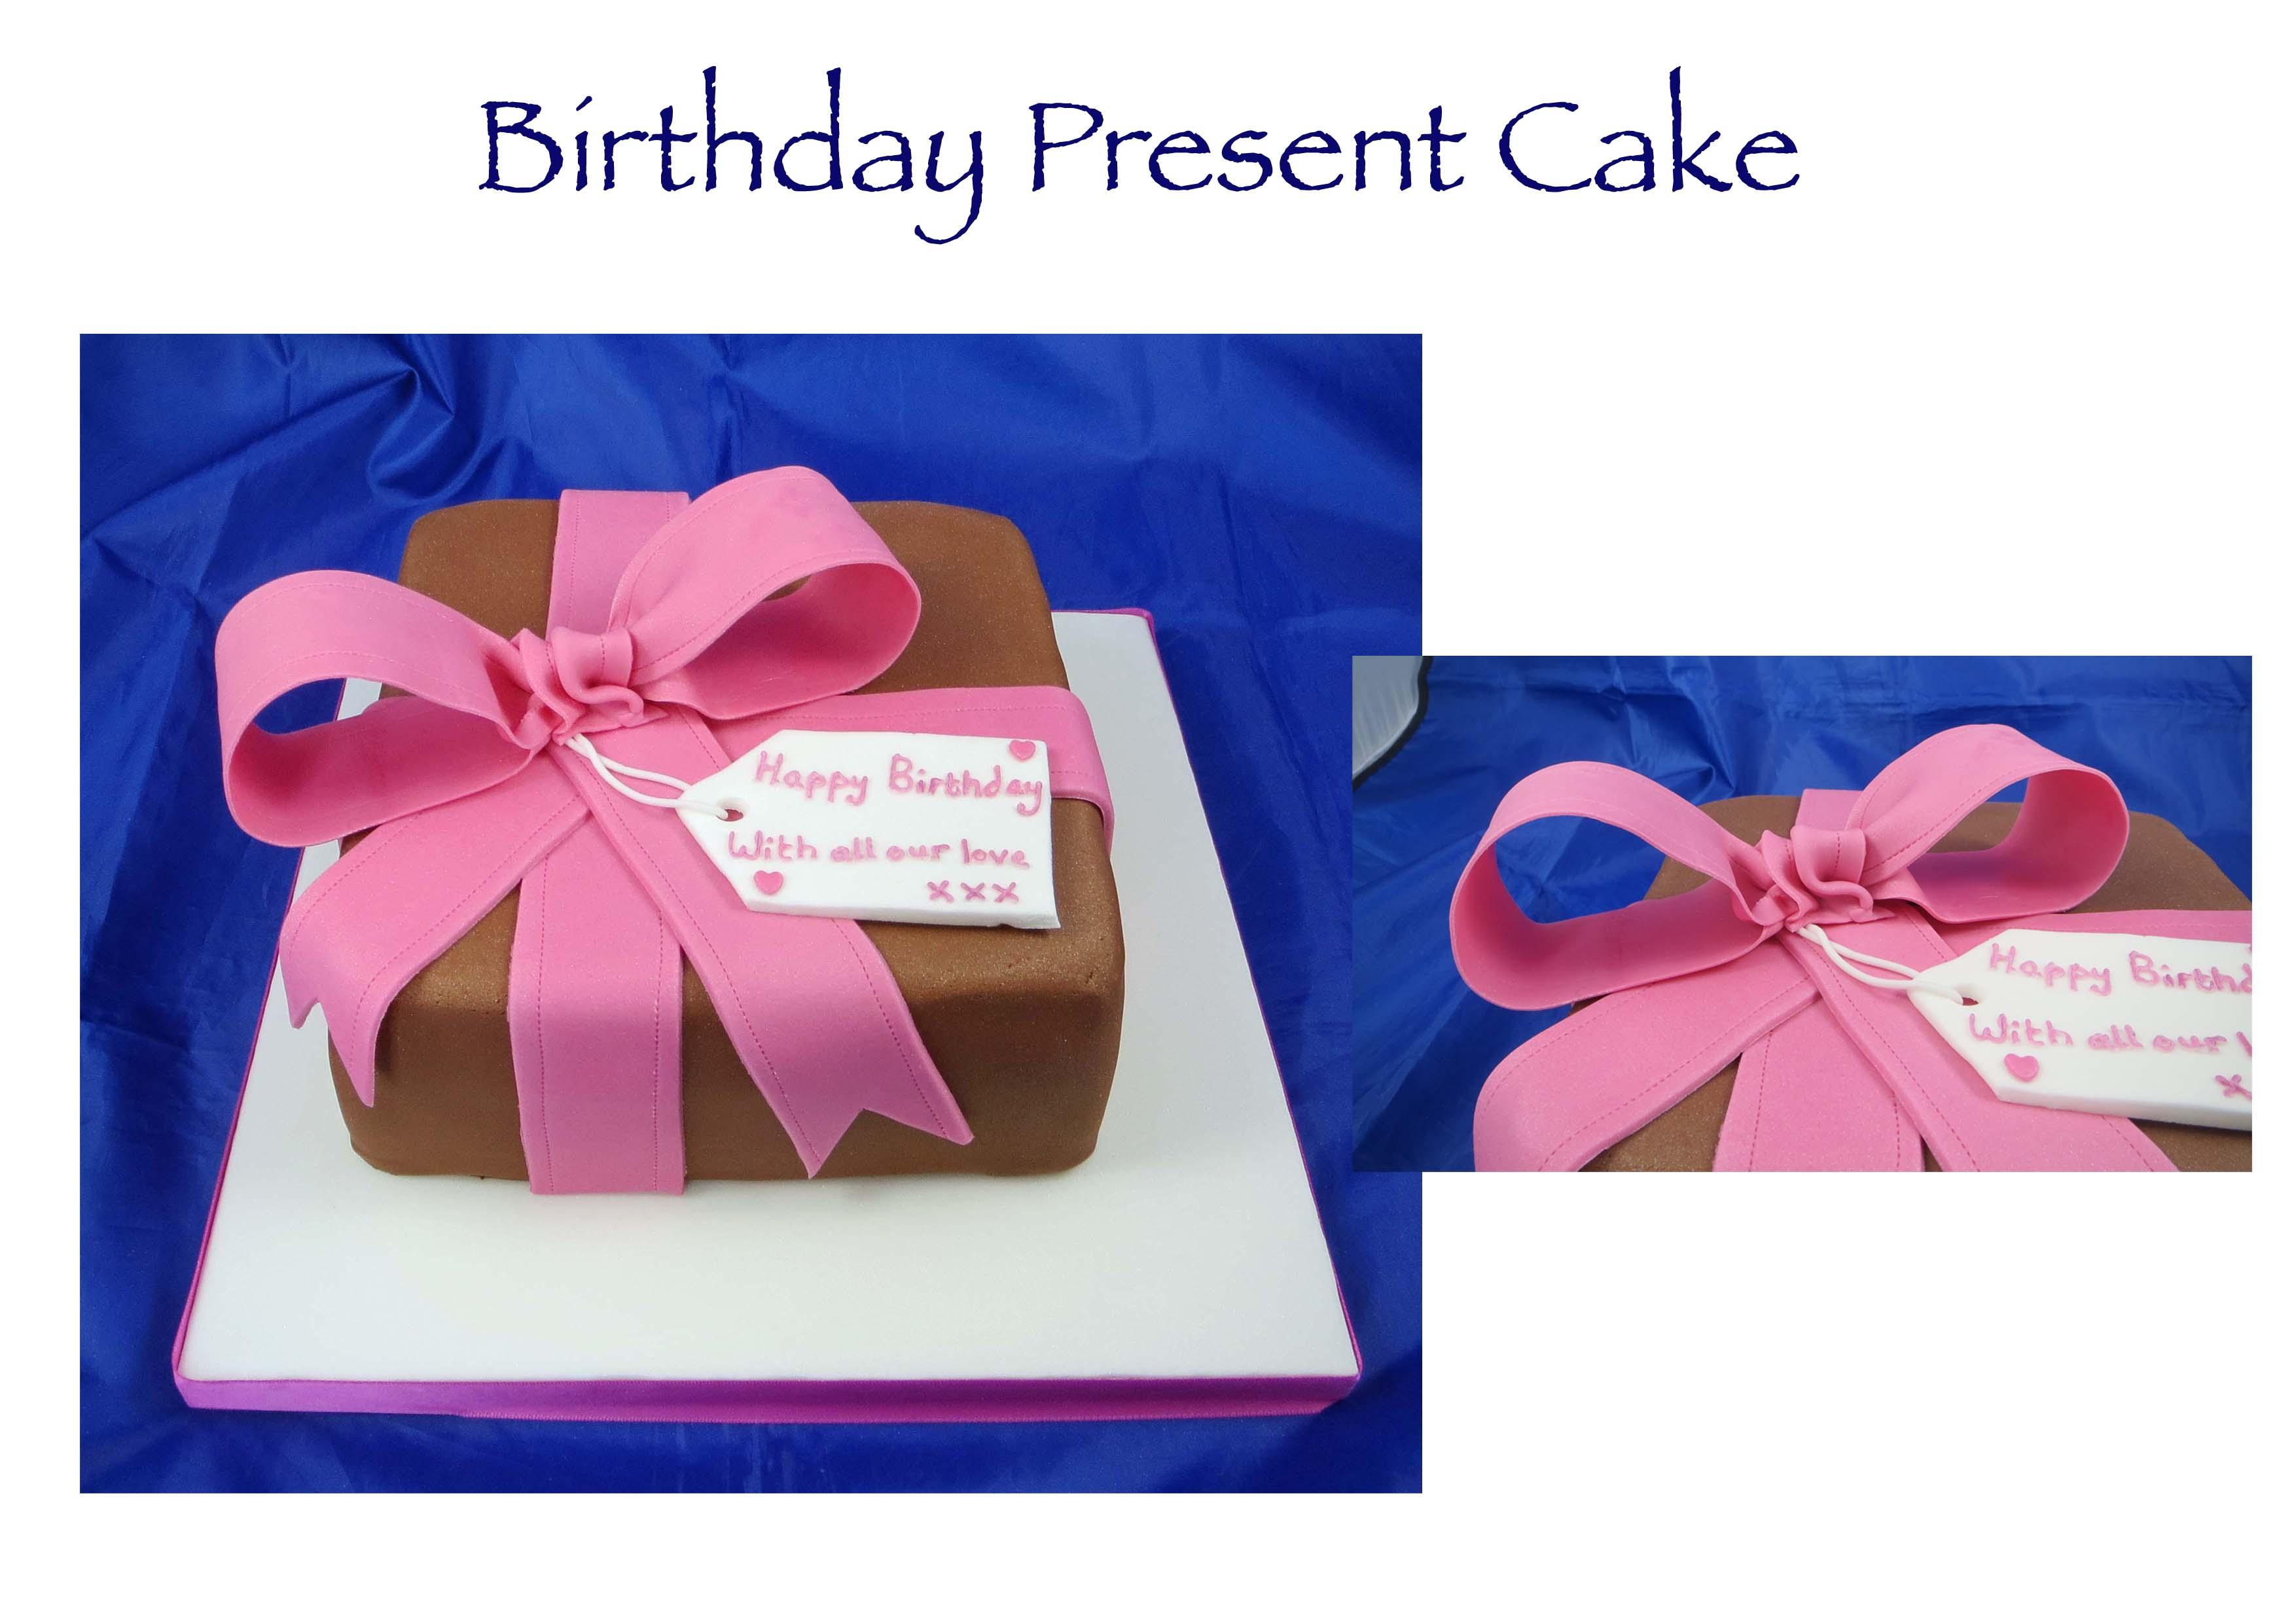 Birthday Present Cake